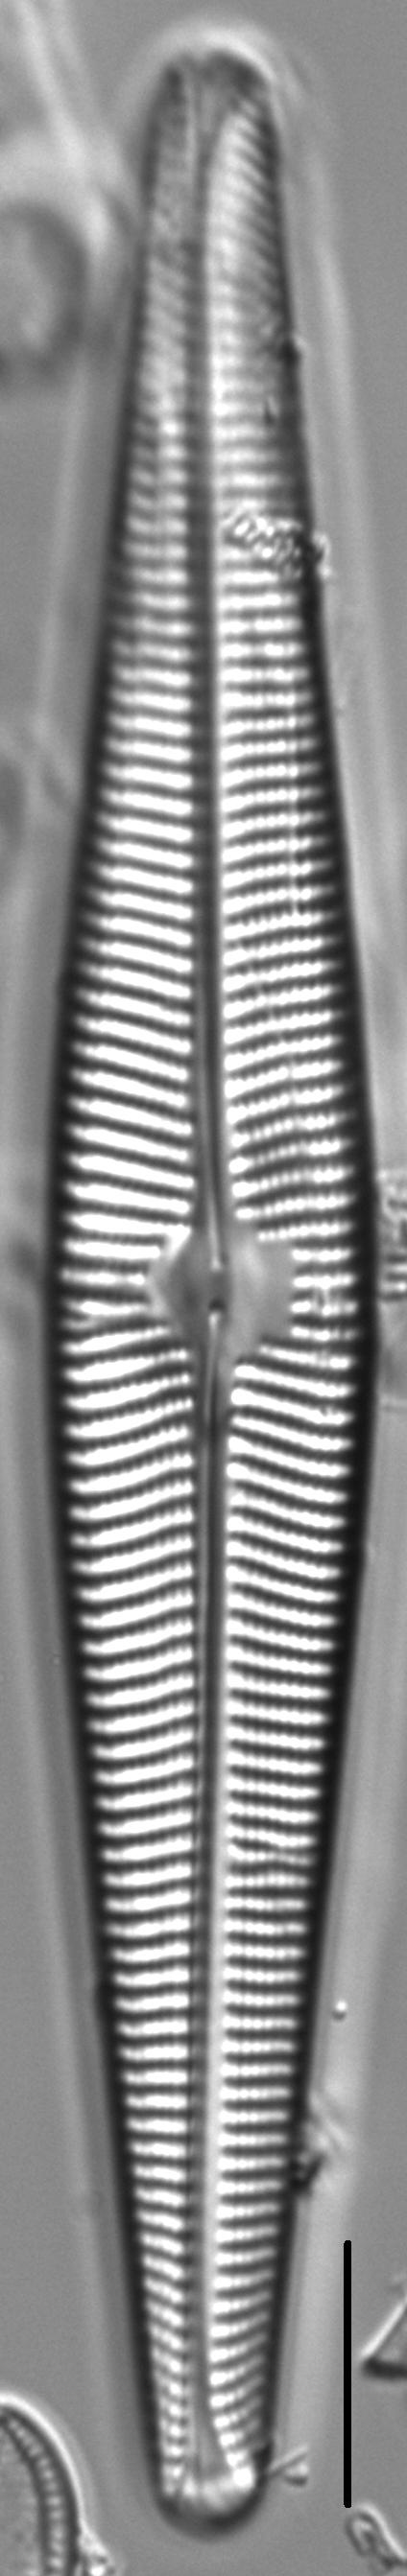 Navicula galloae LM6